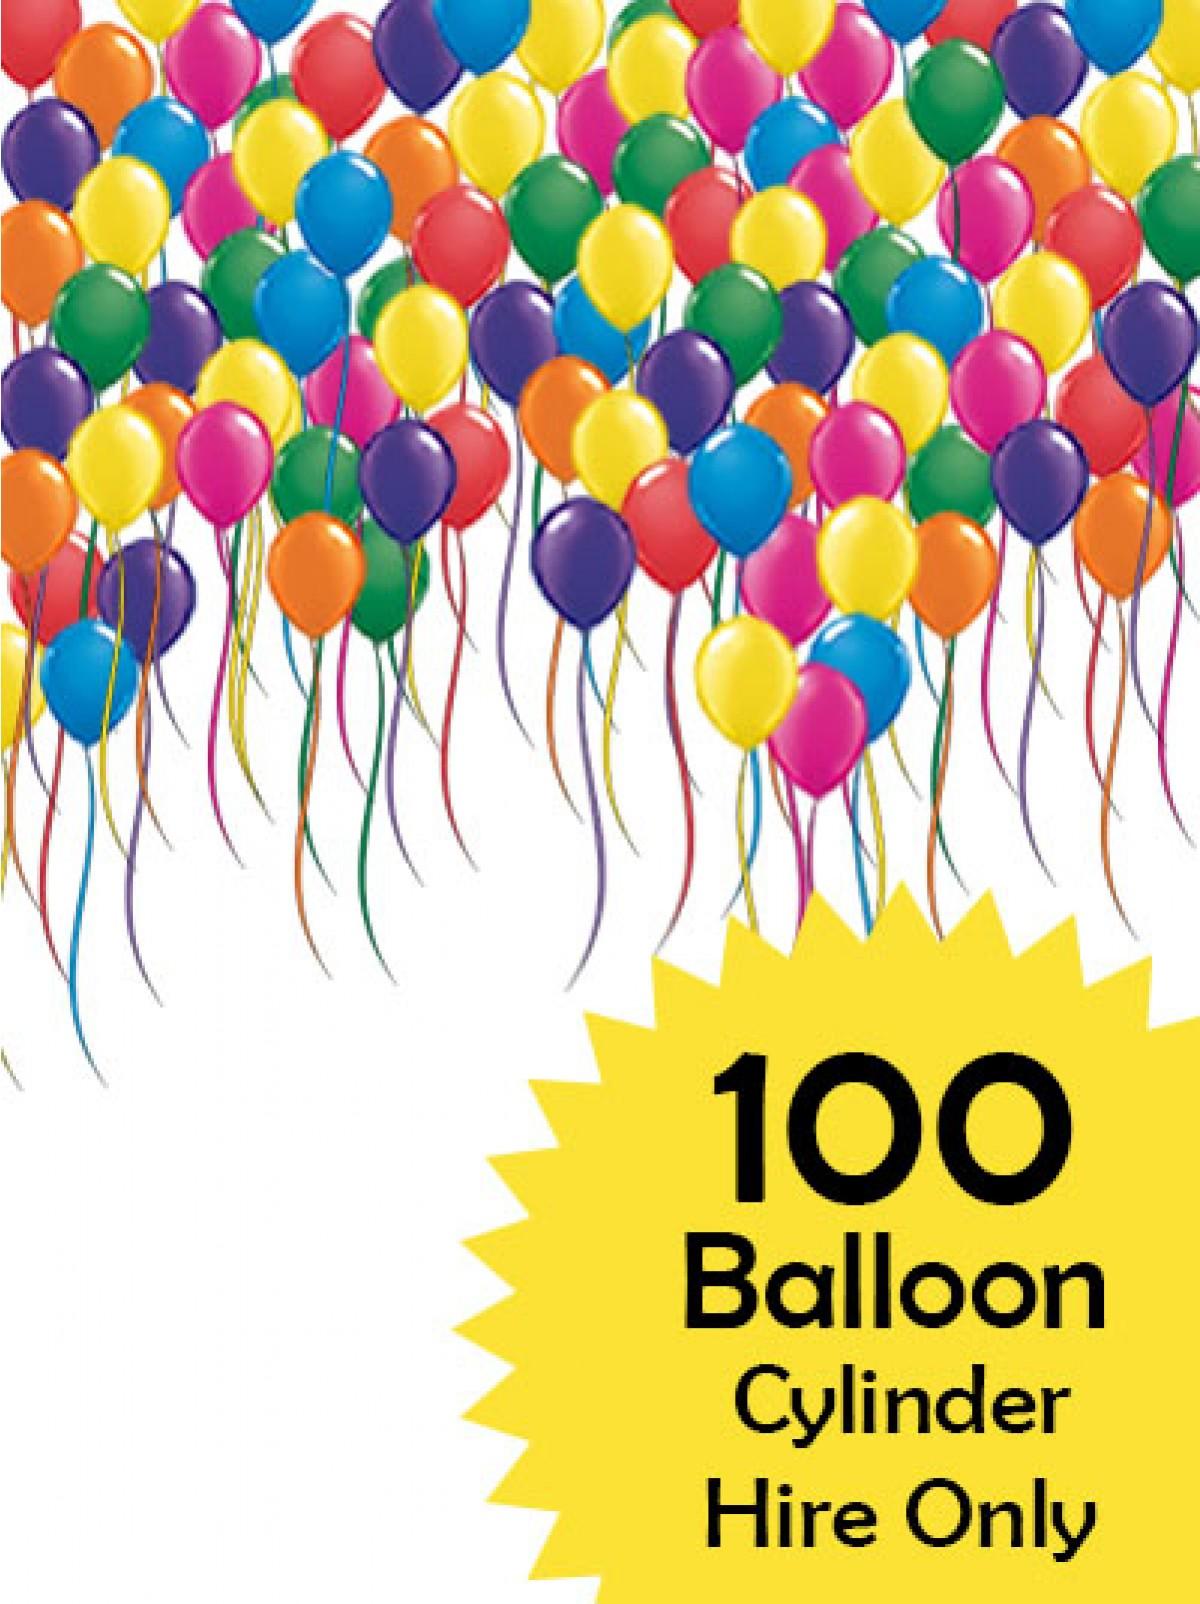 Diy helium for balloons. 100 clipart balloon